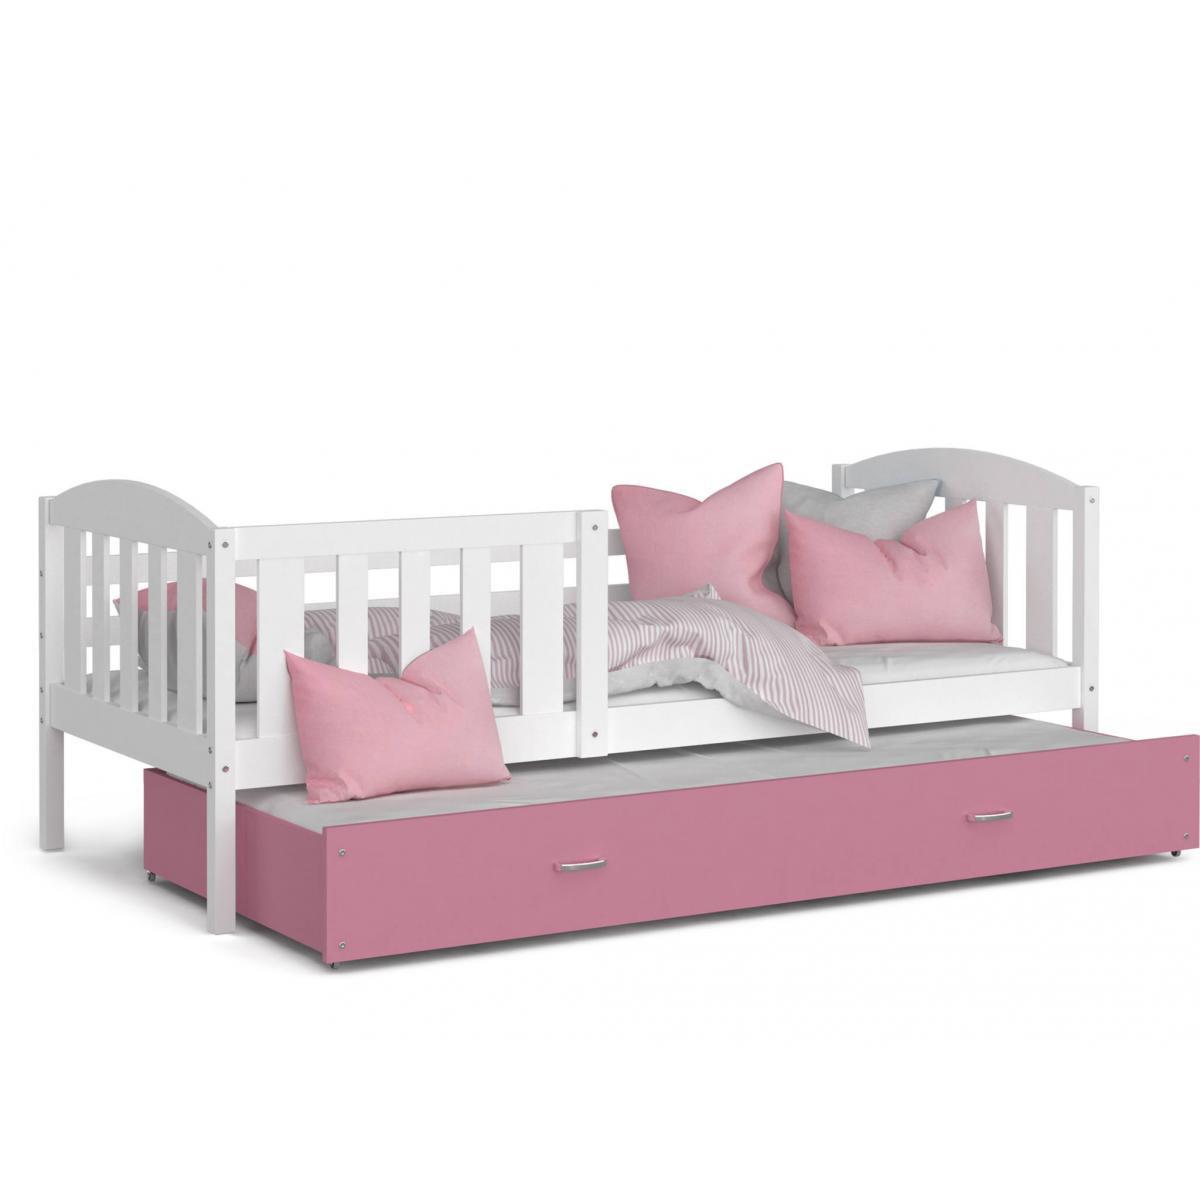 Kids Literie LIT Gigogne Teo 90x190 Blanc - Rose livré avec sommier, tiroir et matelas de 7cm OFFERT.